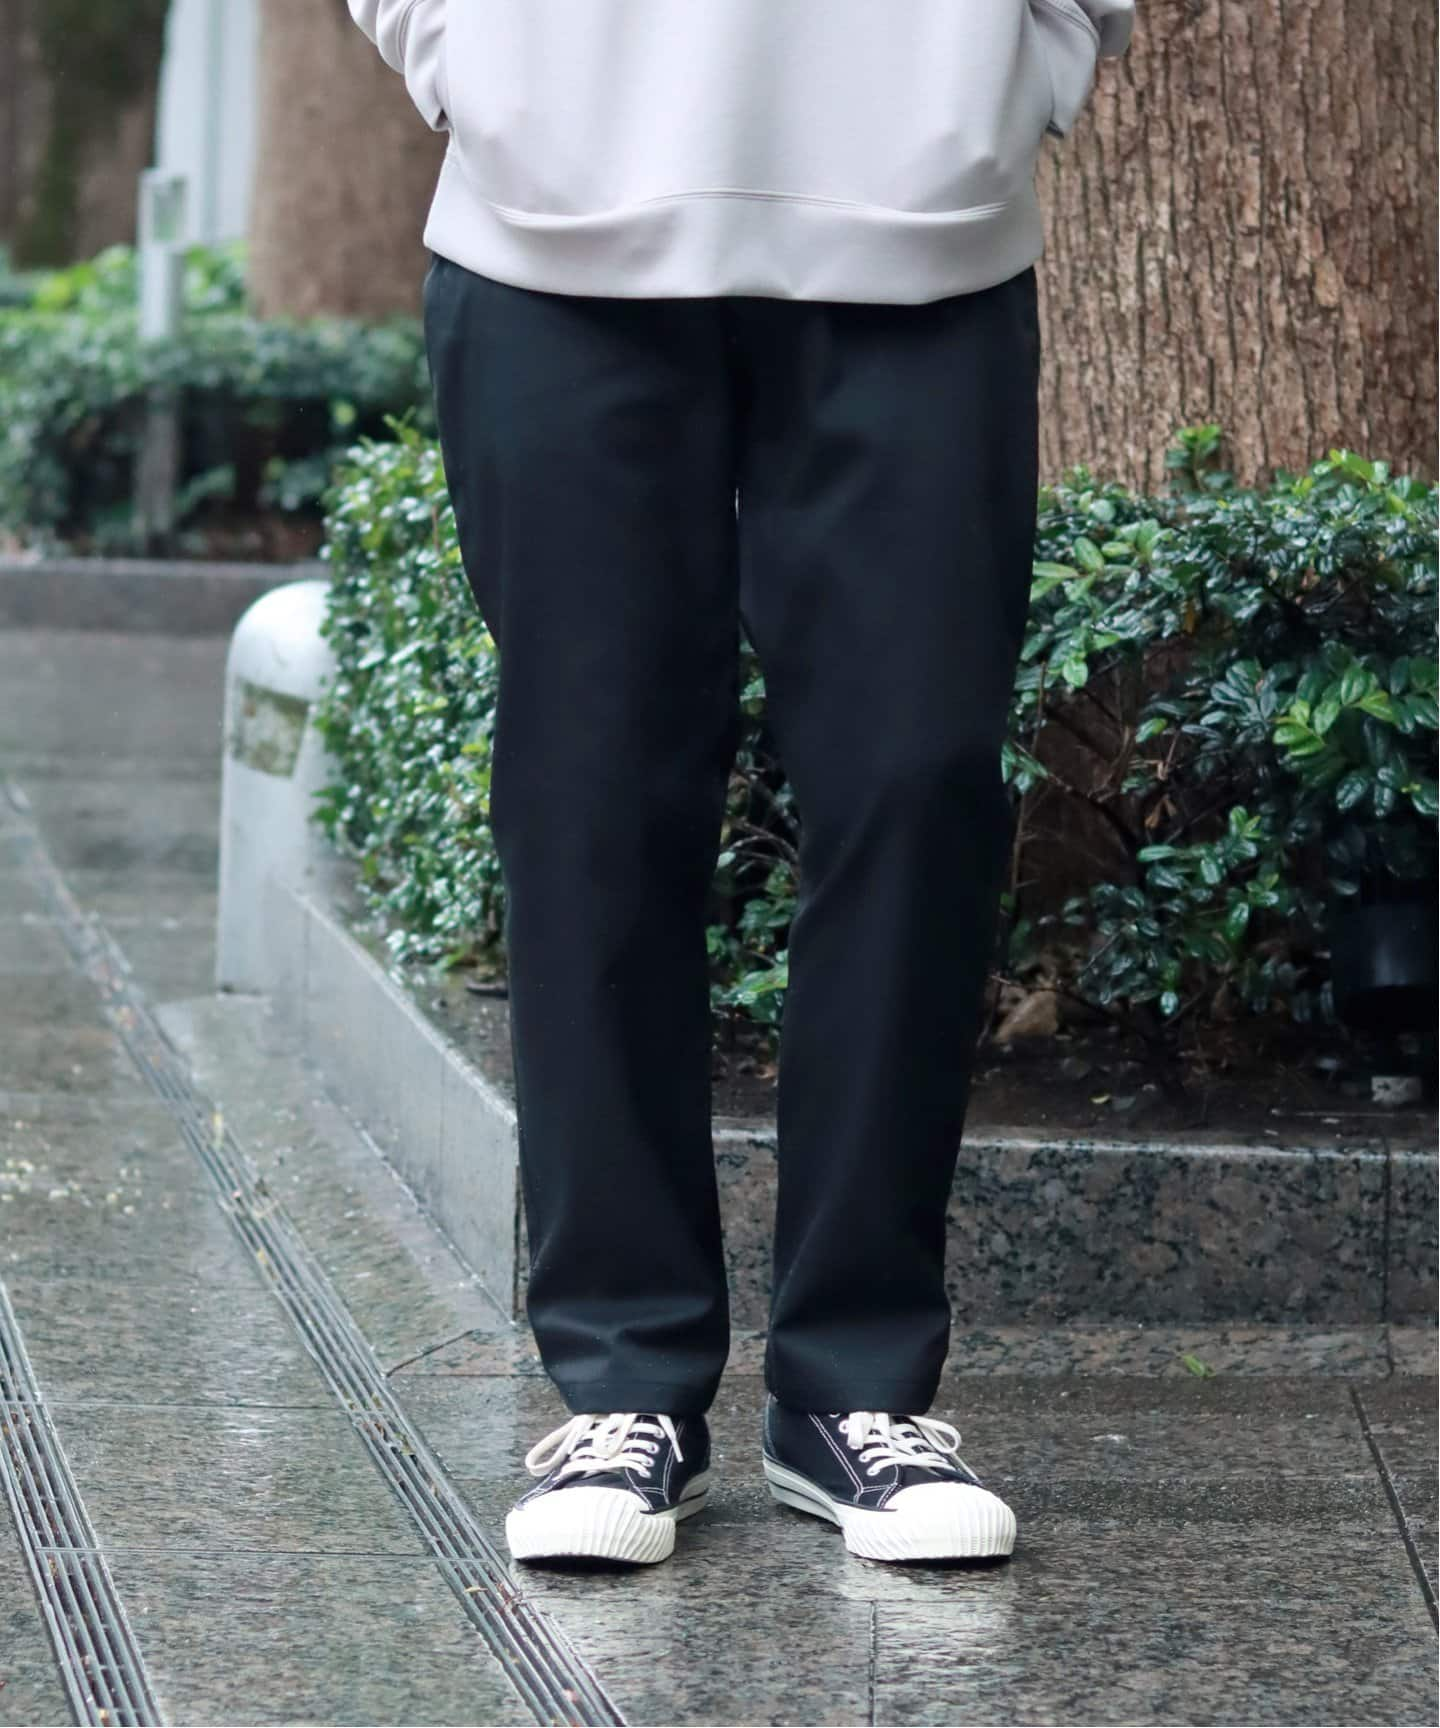 B.C STOCKのパンツ・ズボン/パンツ・ズボン全般 ブラック